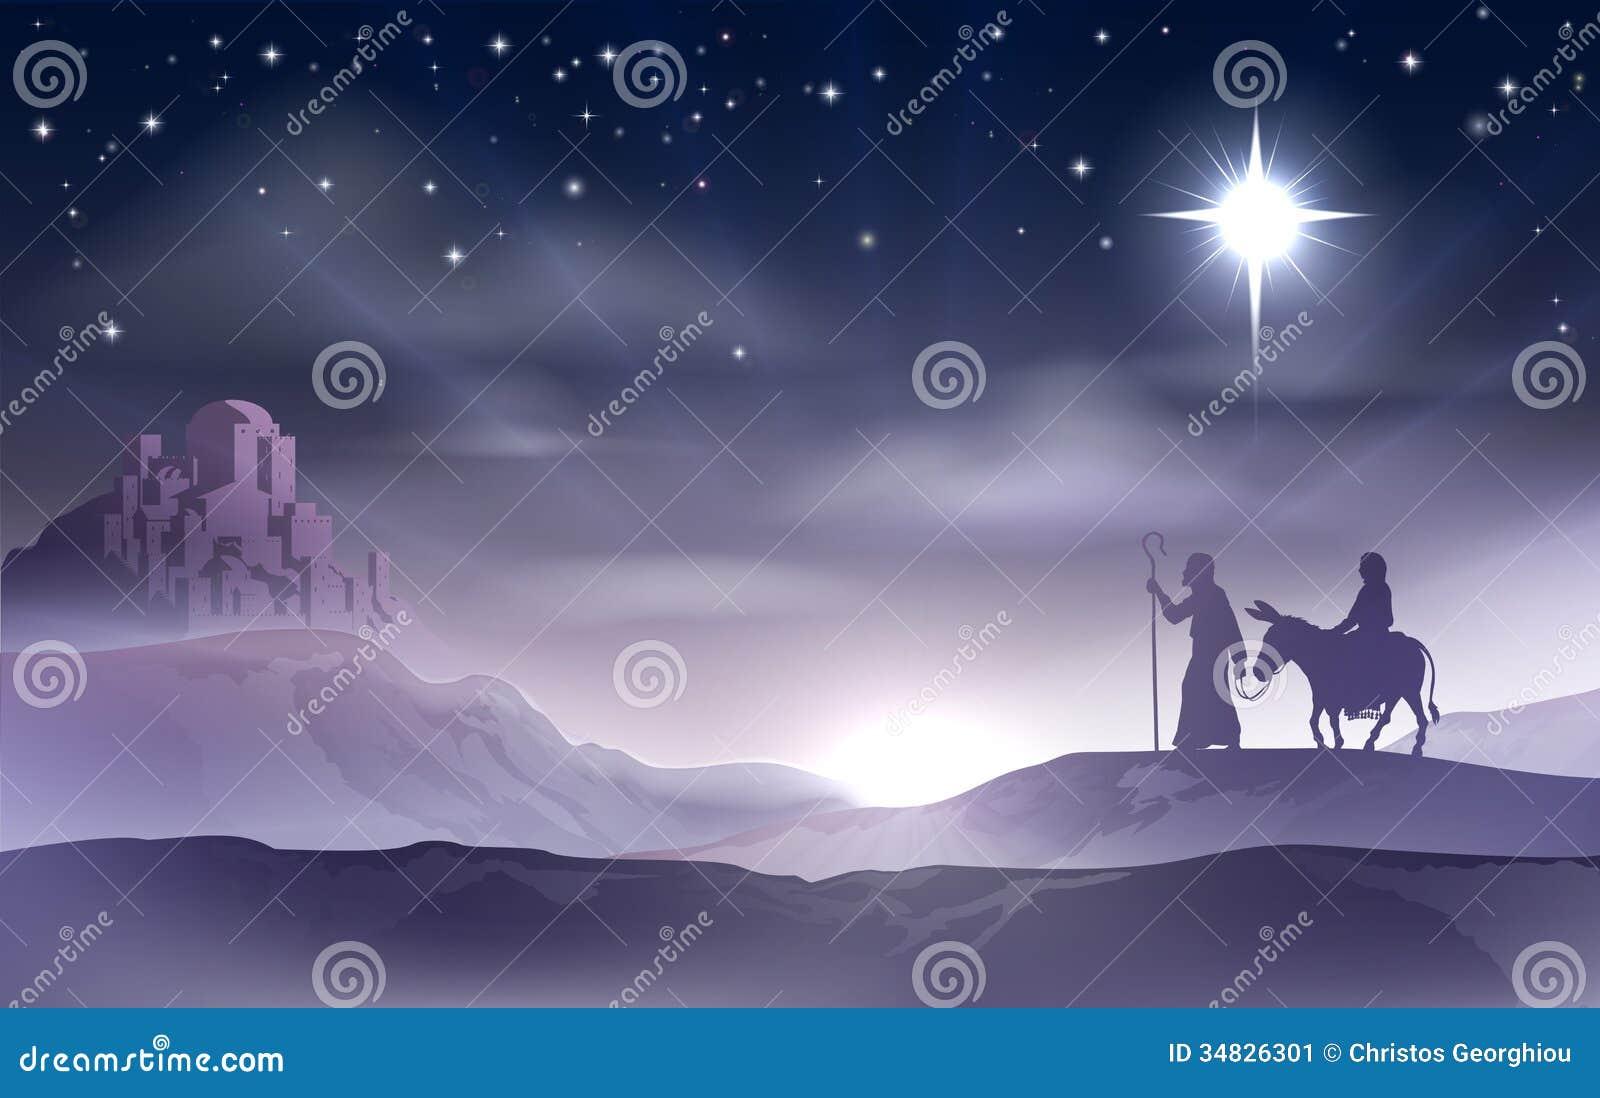 Mary And Joseph Nativity Christmas Illustration Stock Image ...